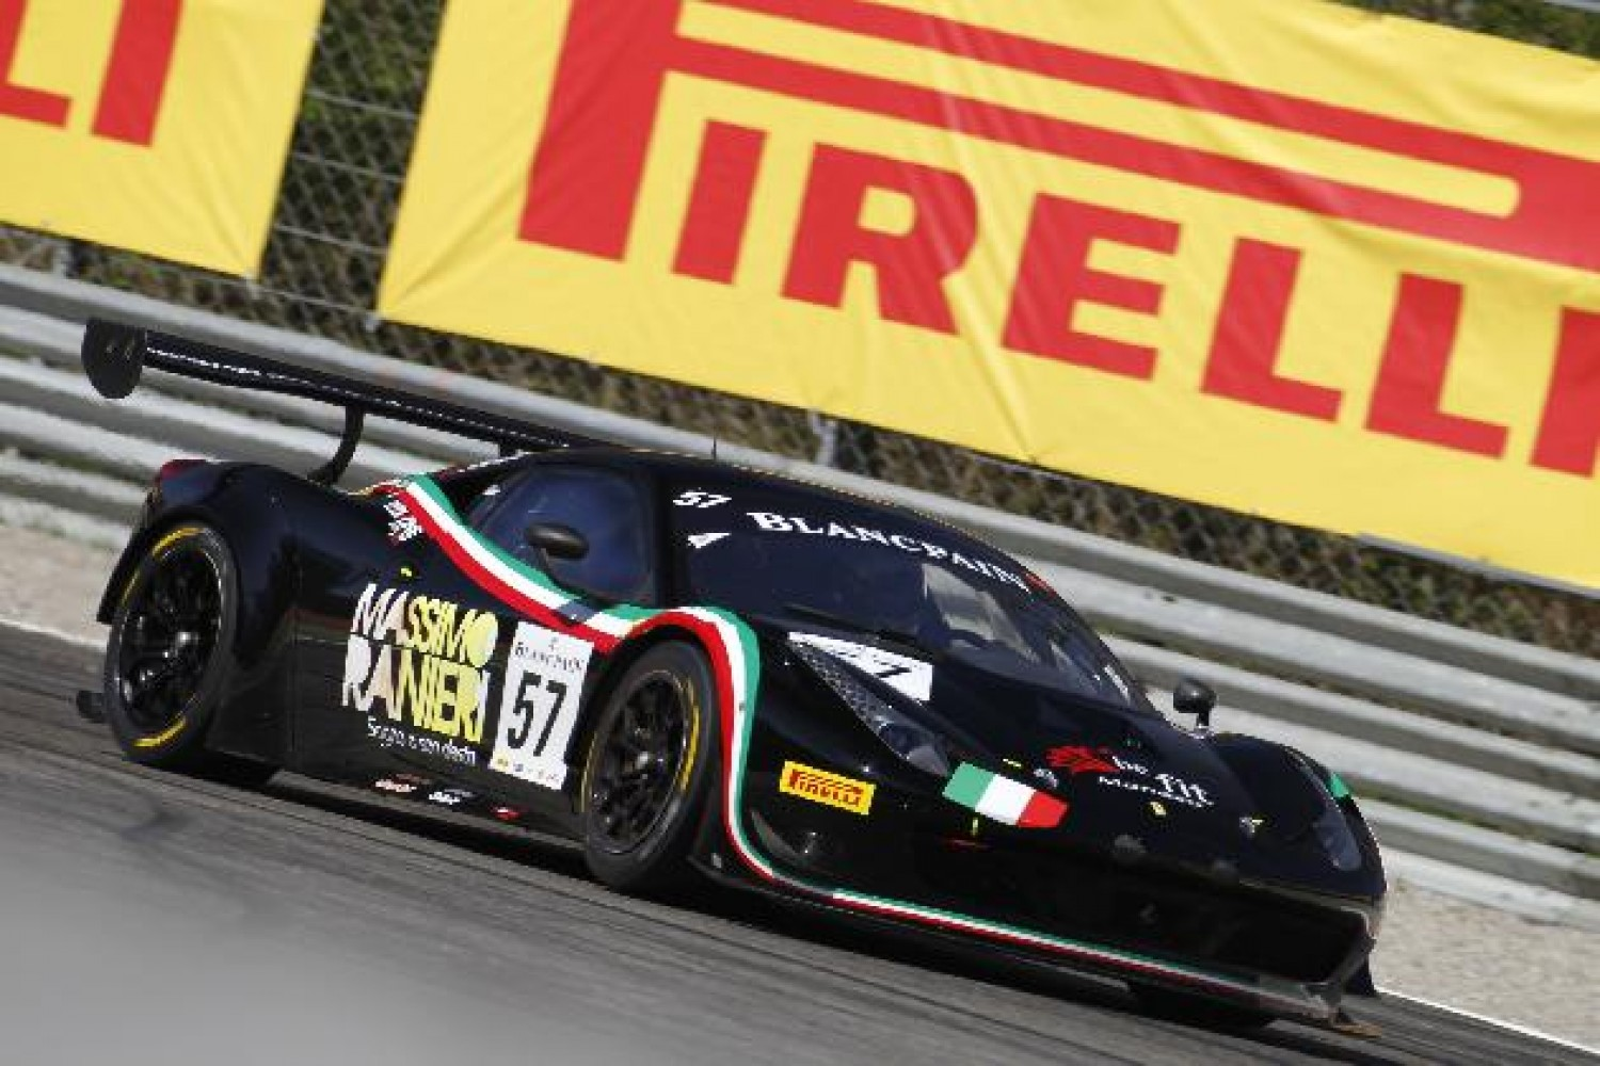 Pirelli enjoy home race at Monza